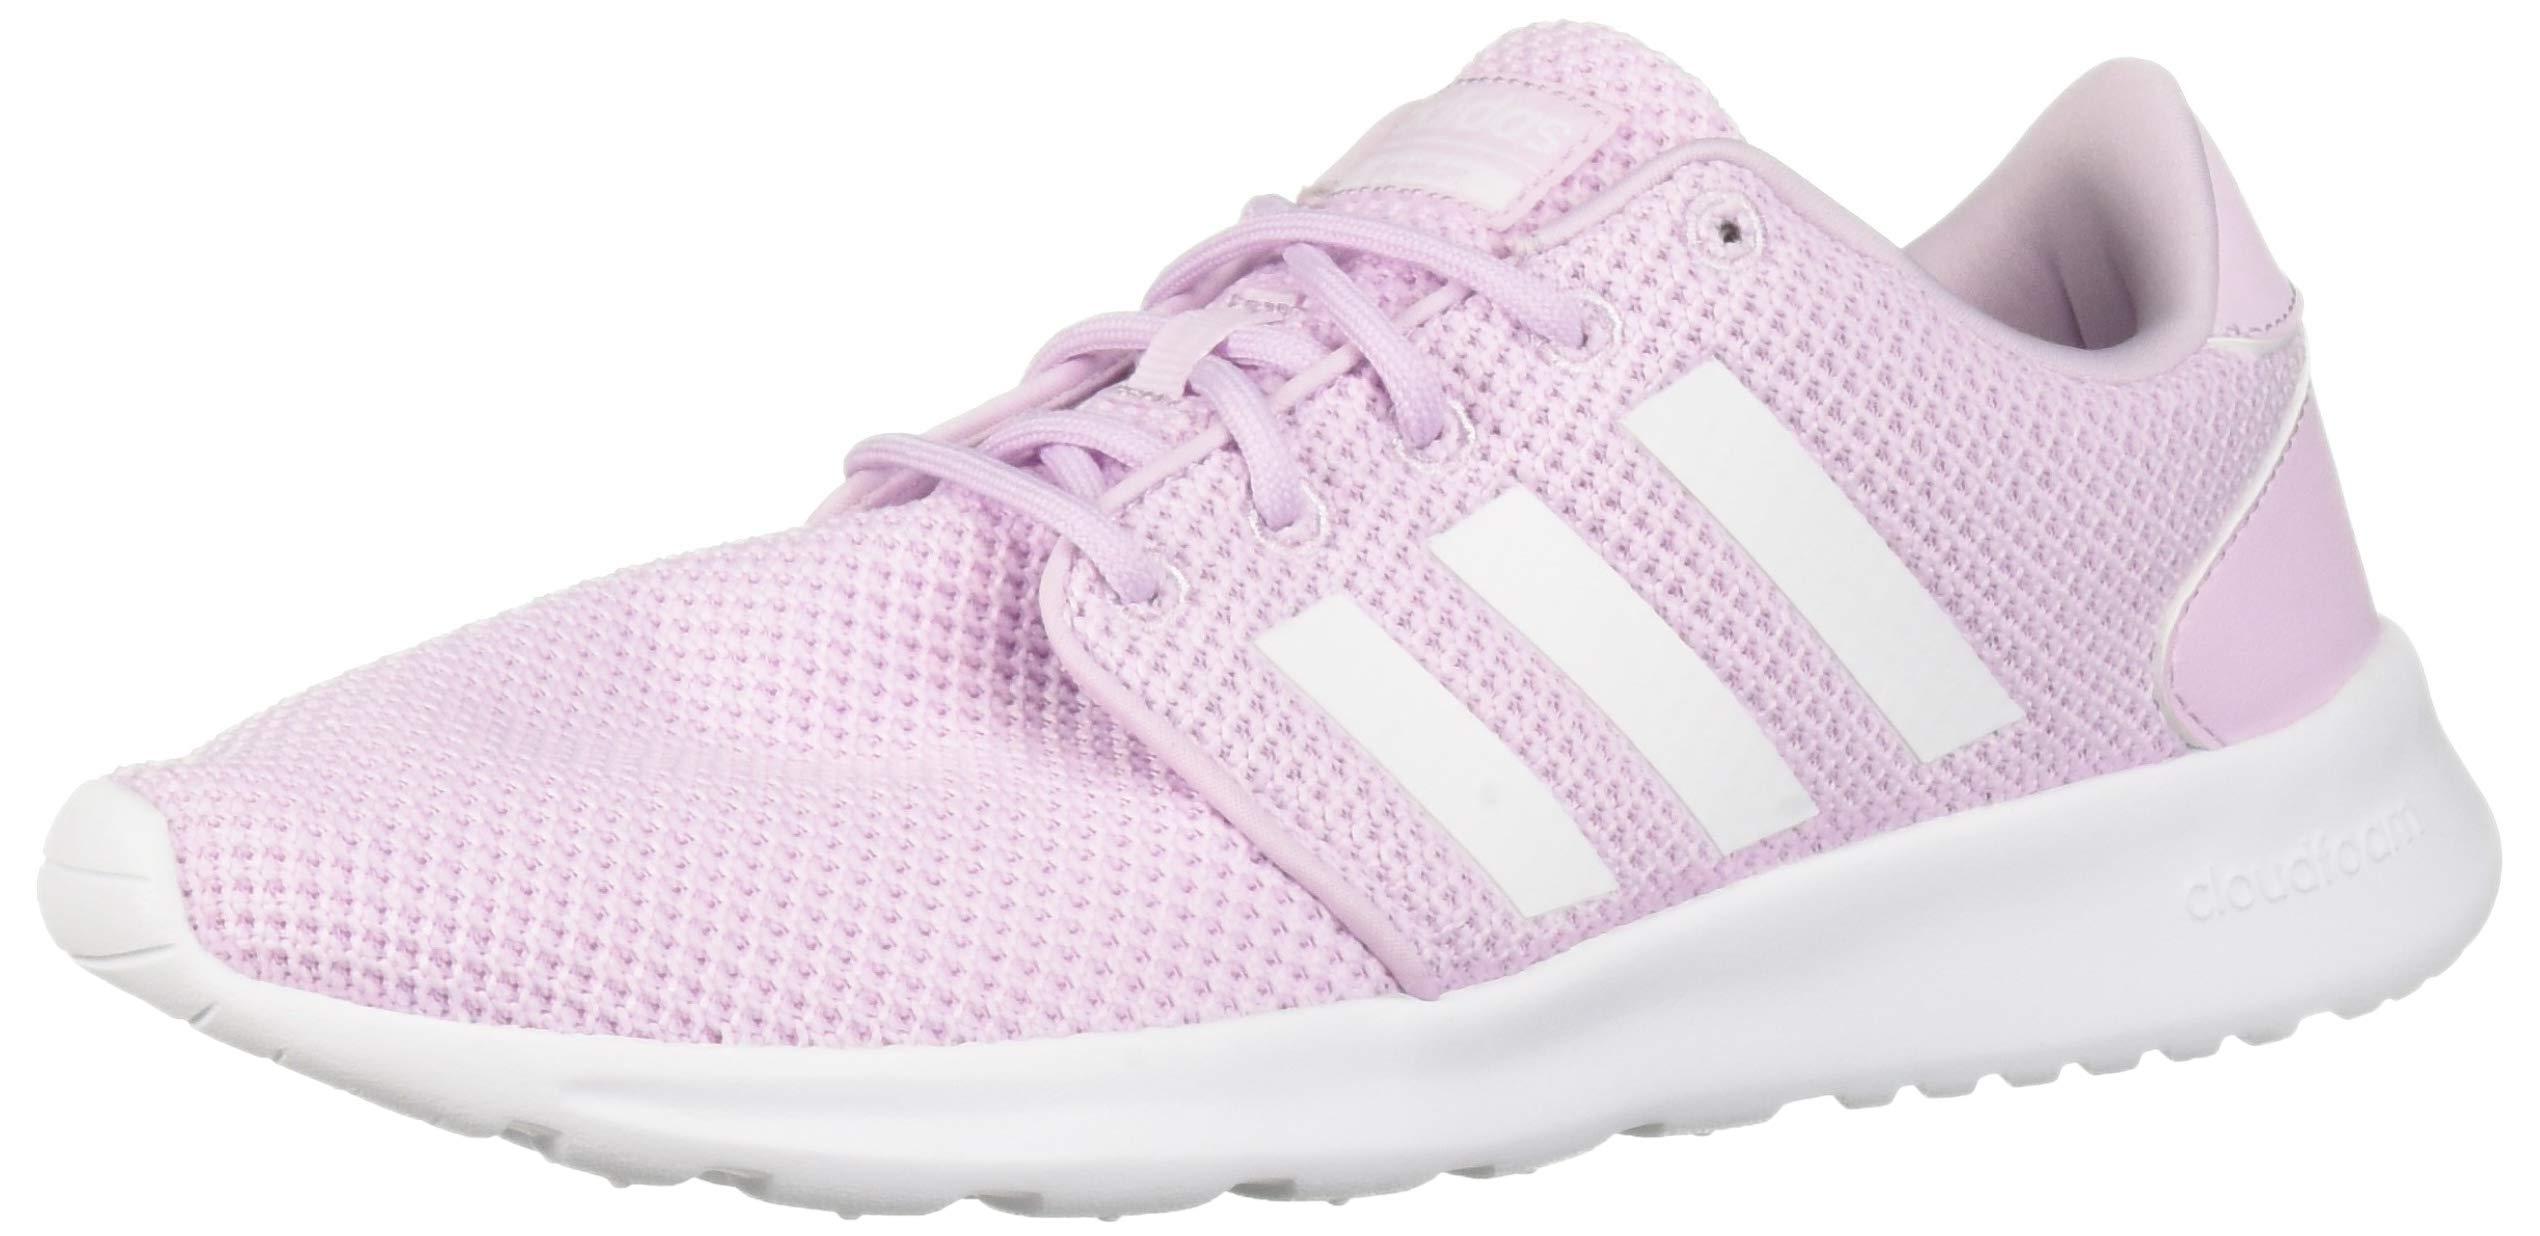 adidas Women's Cloudfoam QT Racer Shoes, White/aero Pink, 5 M US